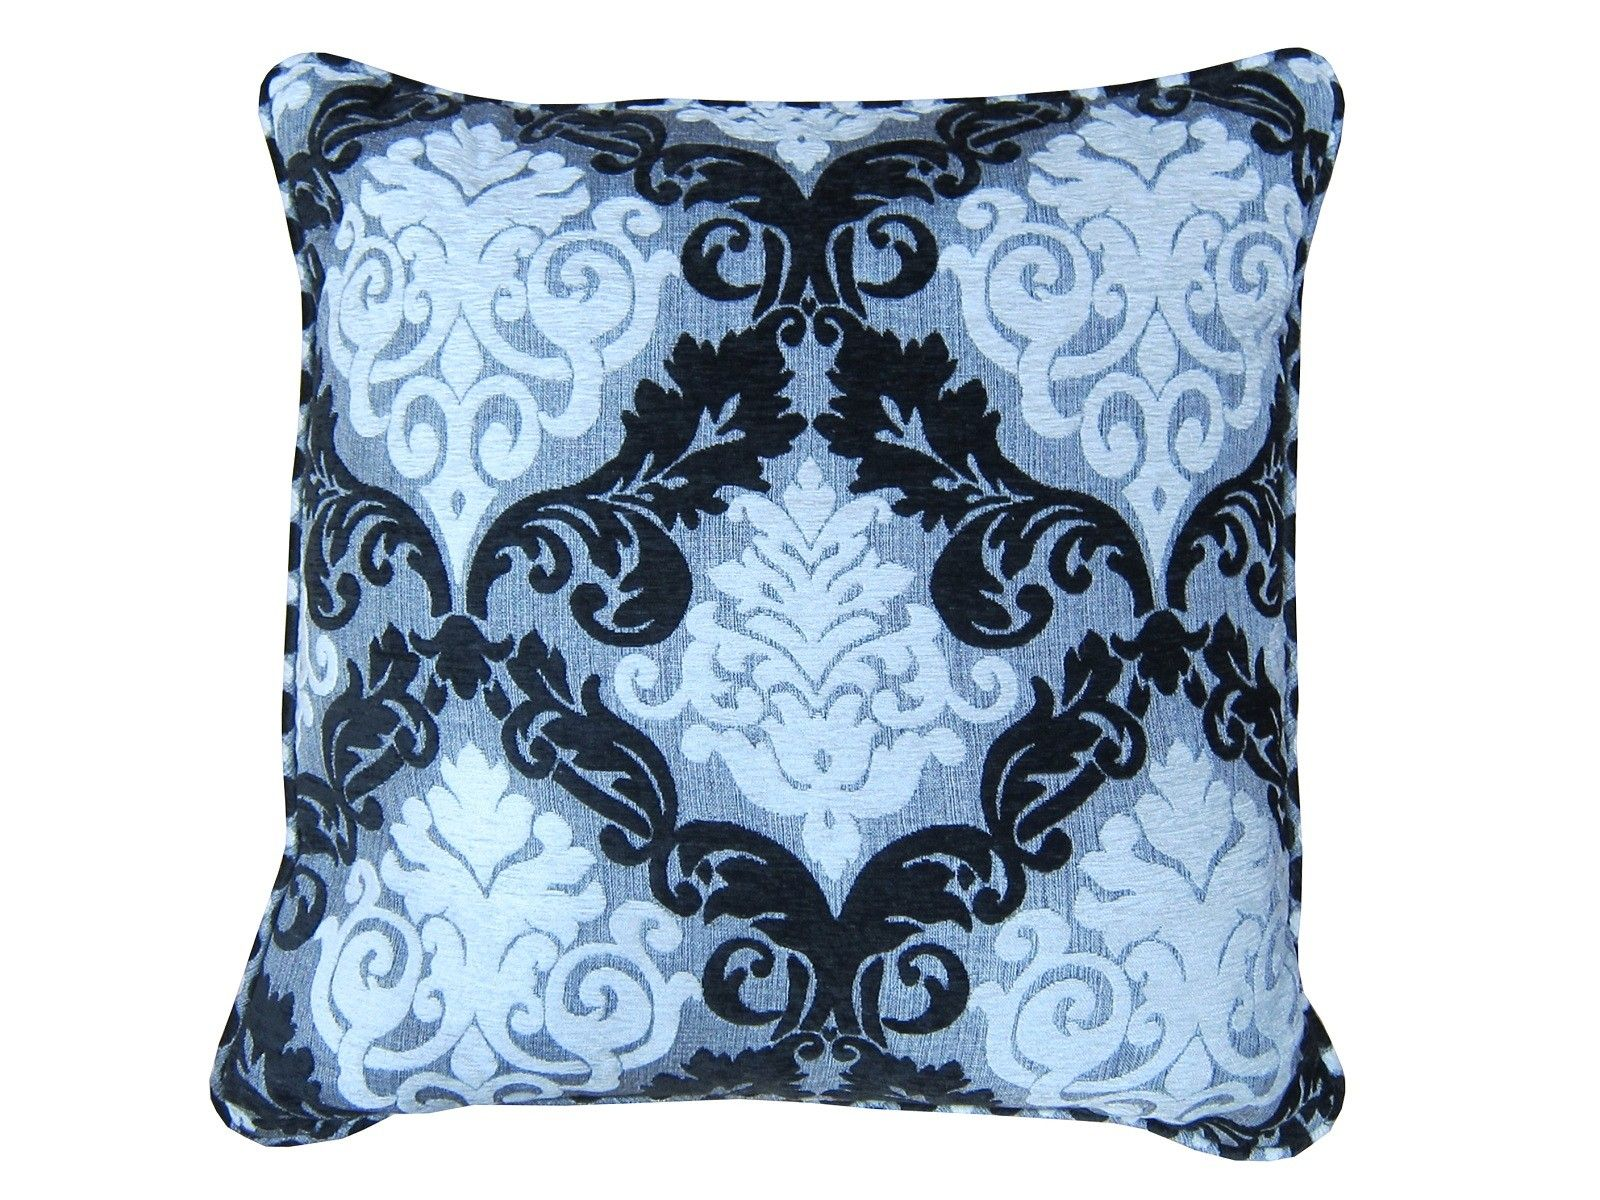 Rodeo Home Throw Pillow : Adriana pillow from Rodeo Home Pillows Pinterest Pillows